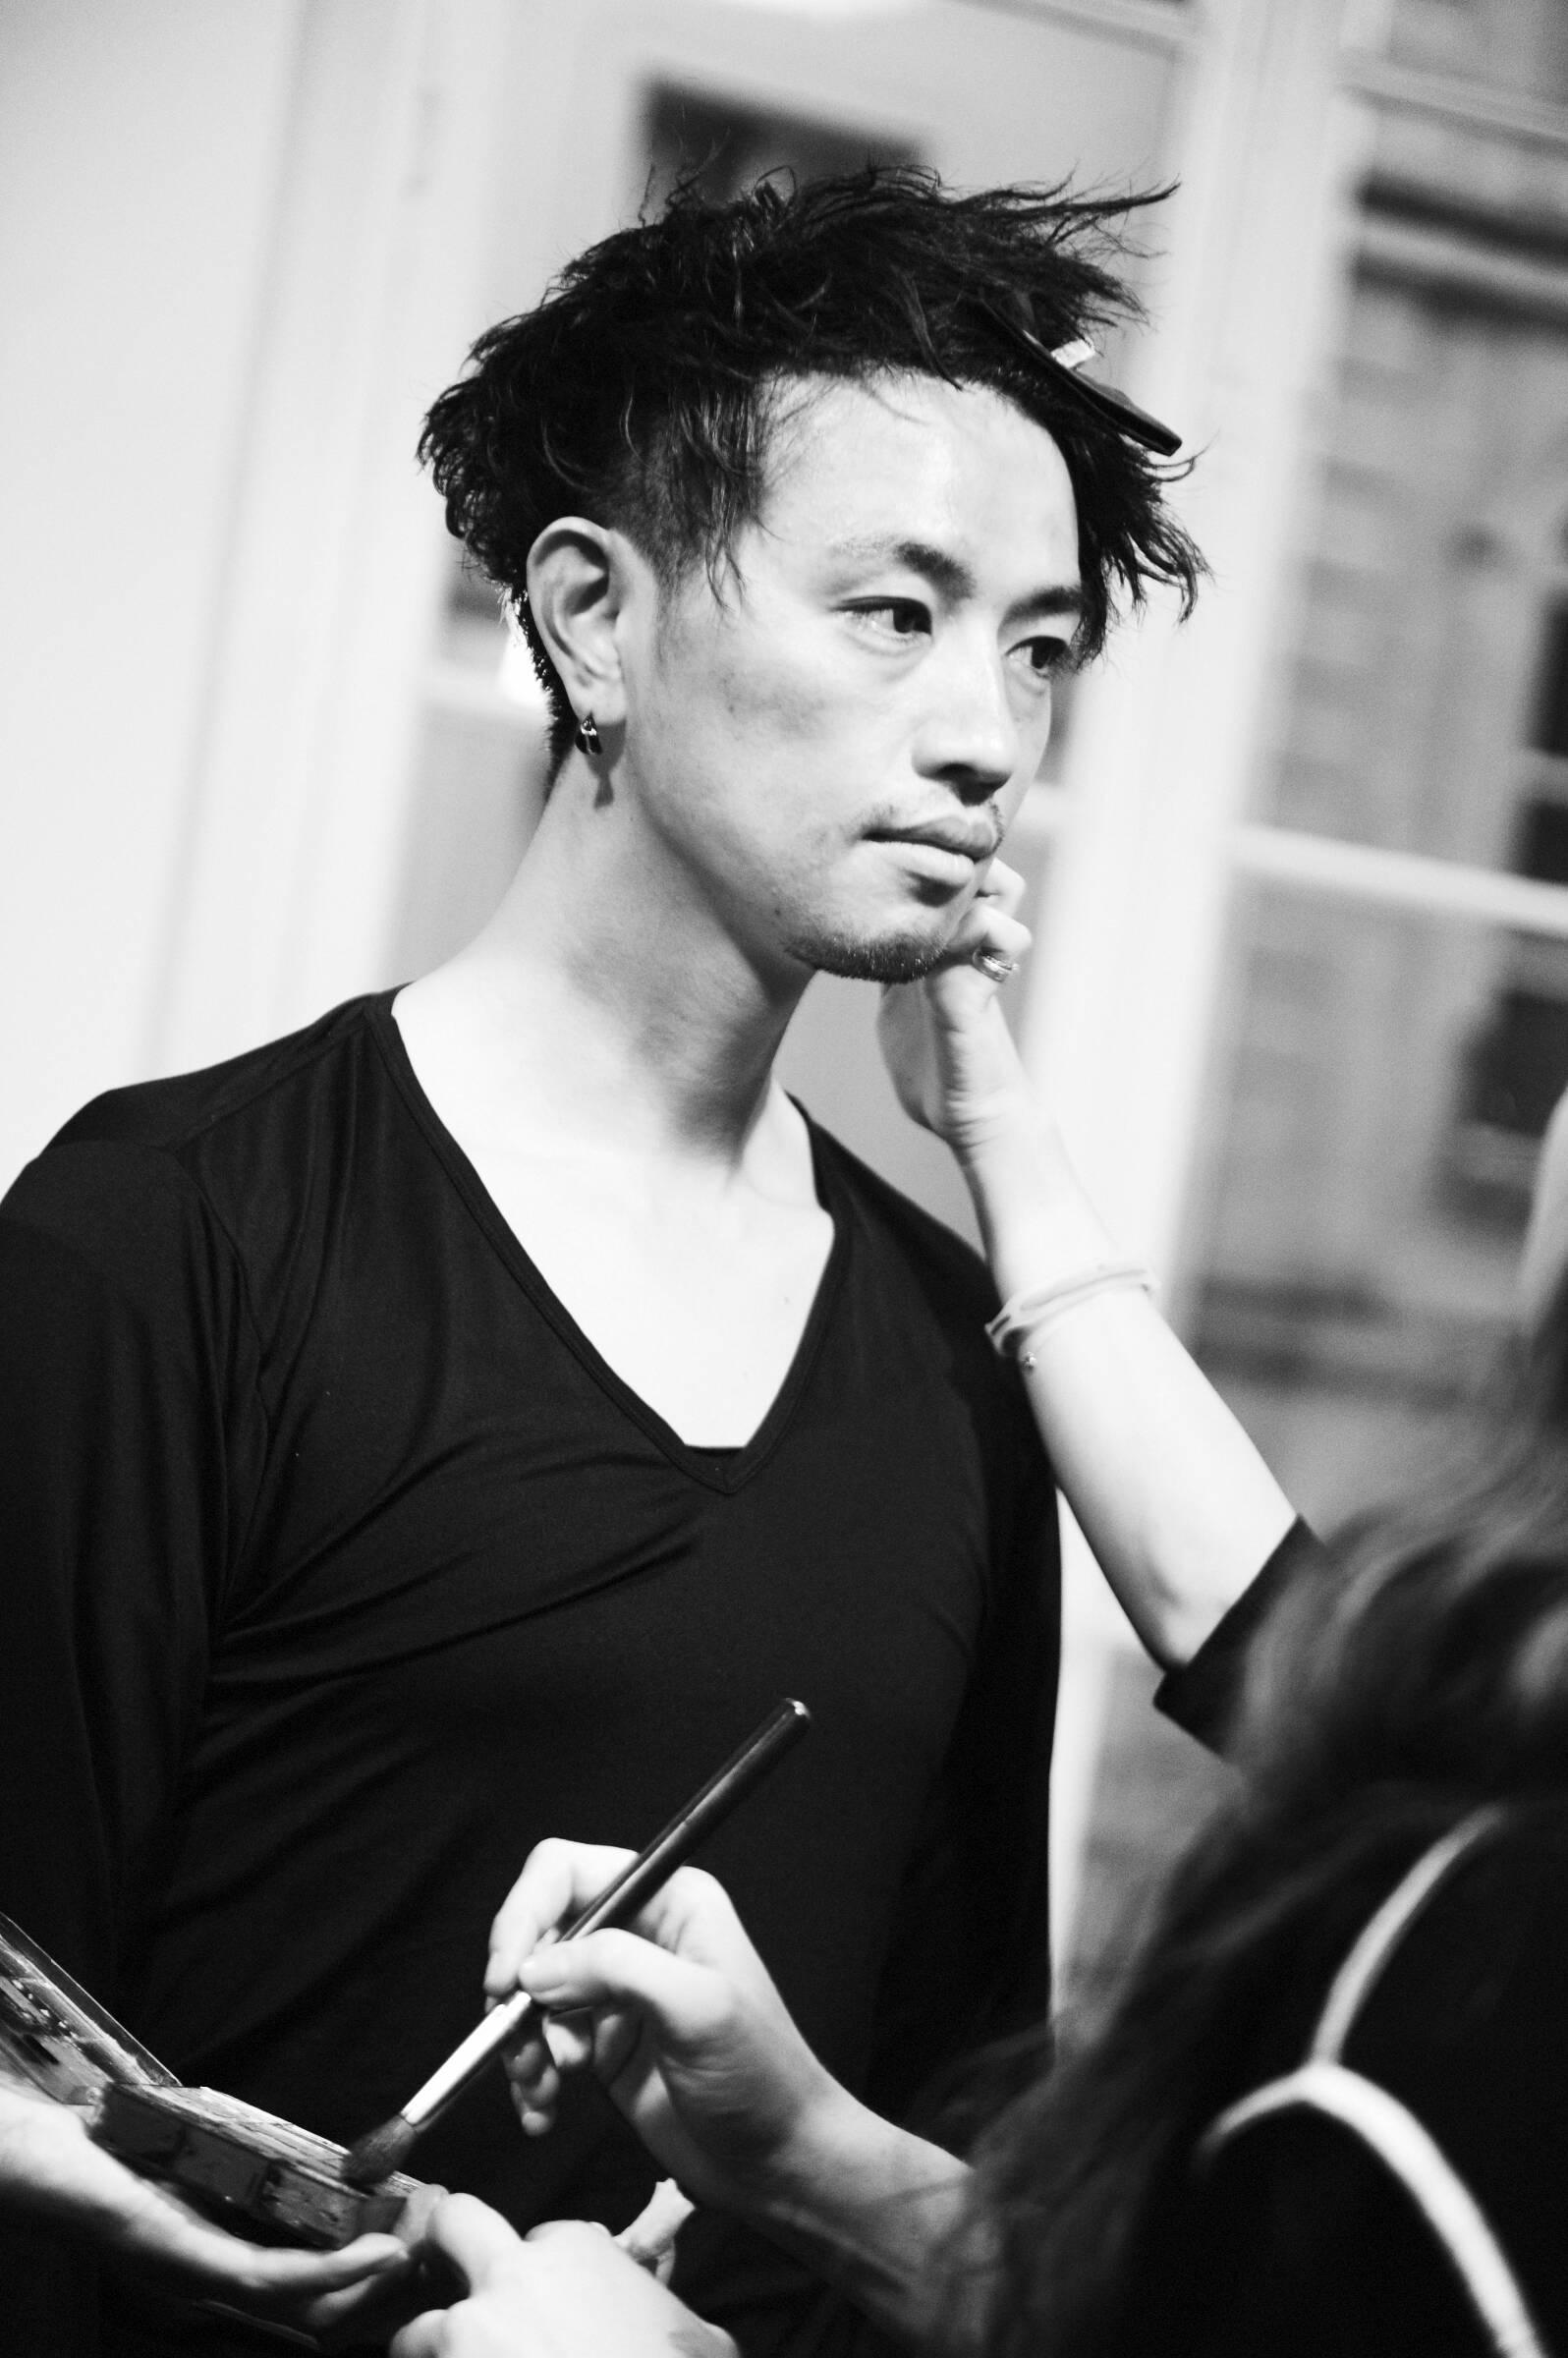 Model Make Up Backstage Yohji Yamamoto Fashion Show 2017-18